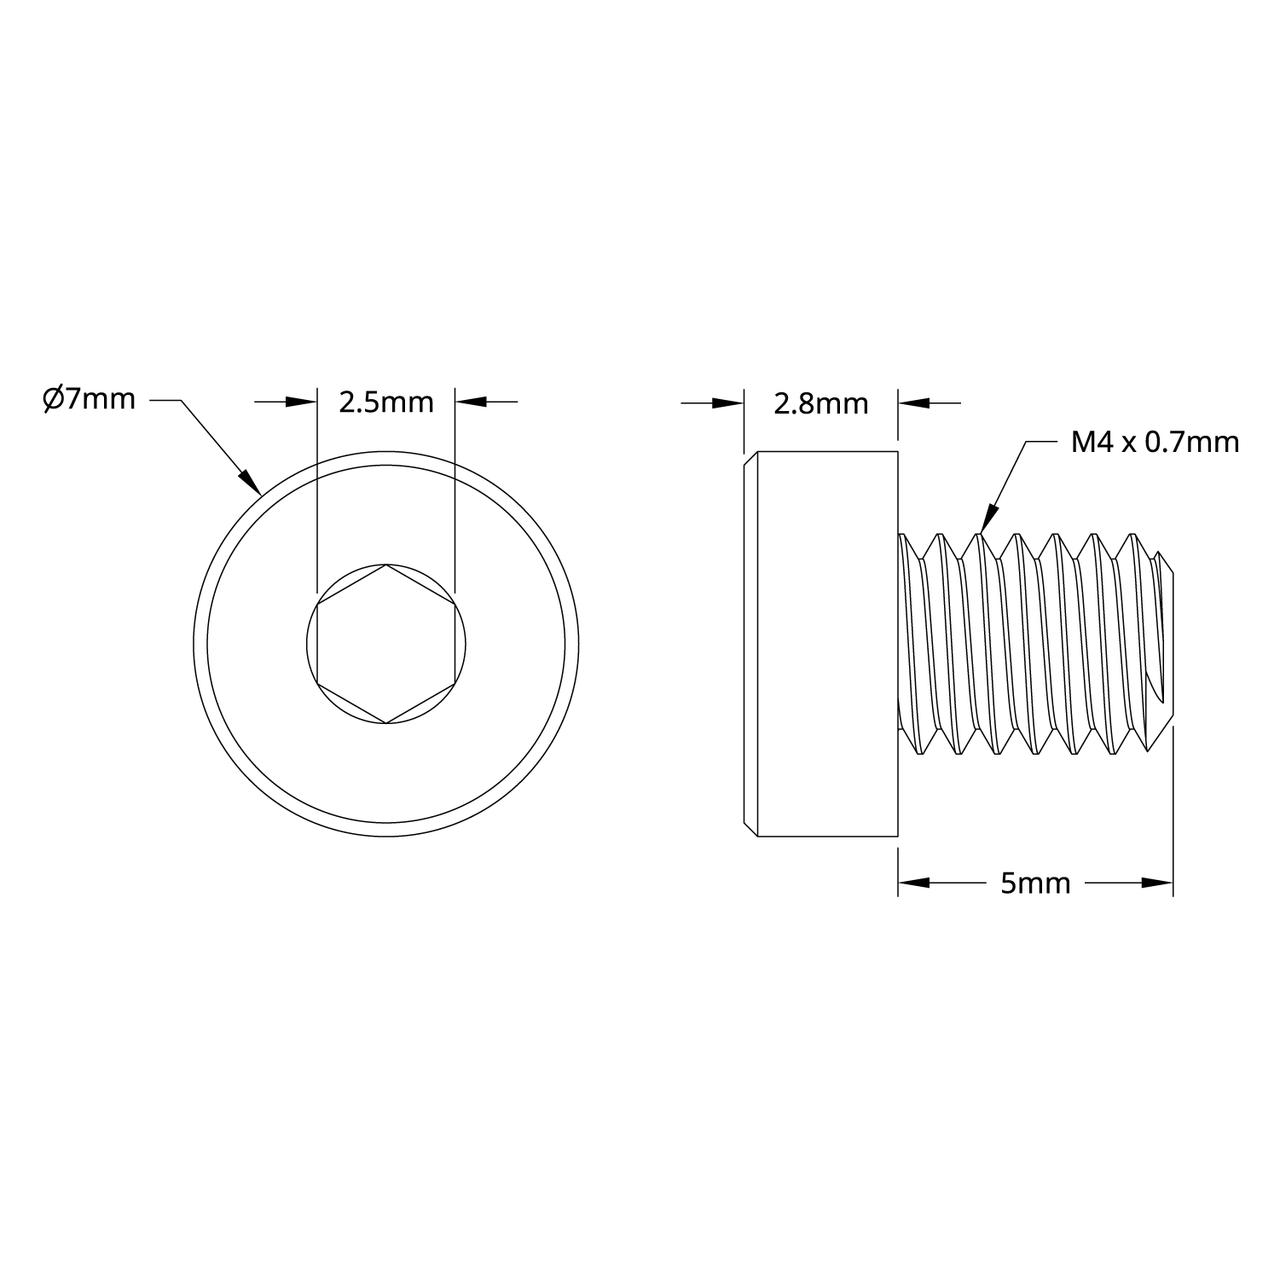 2804 Series Zinc-Plated Steel Low Profile Socket Head (M4 x ... on remington 870 schematic, m249 schematic, overdrive schematic, mossberg 500 schematic, g3 schematic, ar schematic, m16 schematic, m16a1 schematic, s3 schematic, simple distortion pedal schematic,